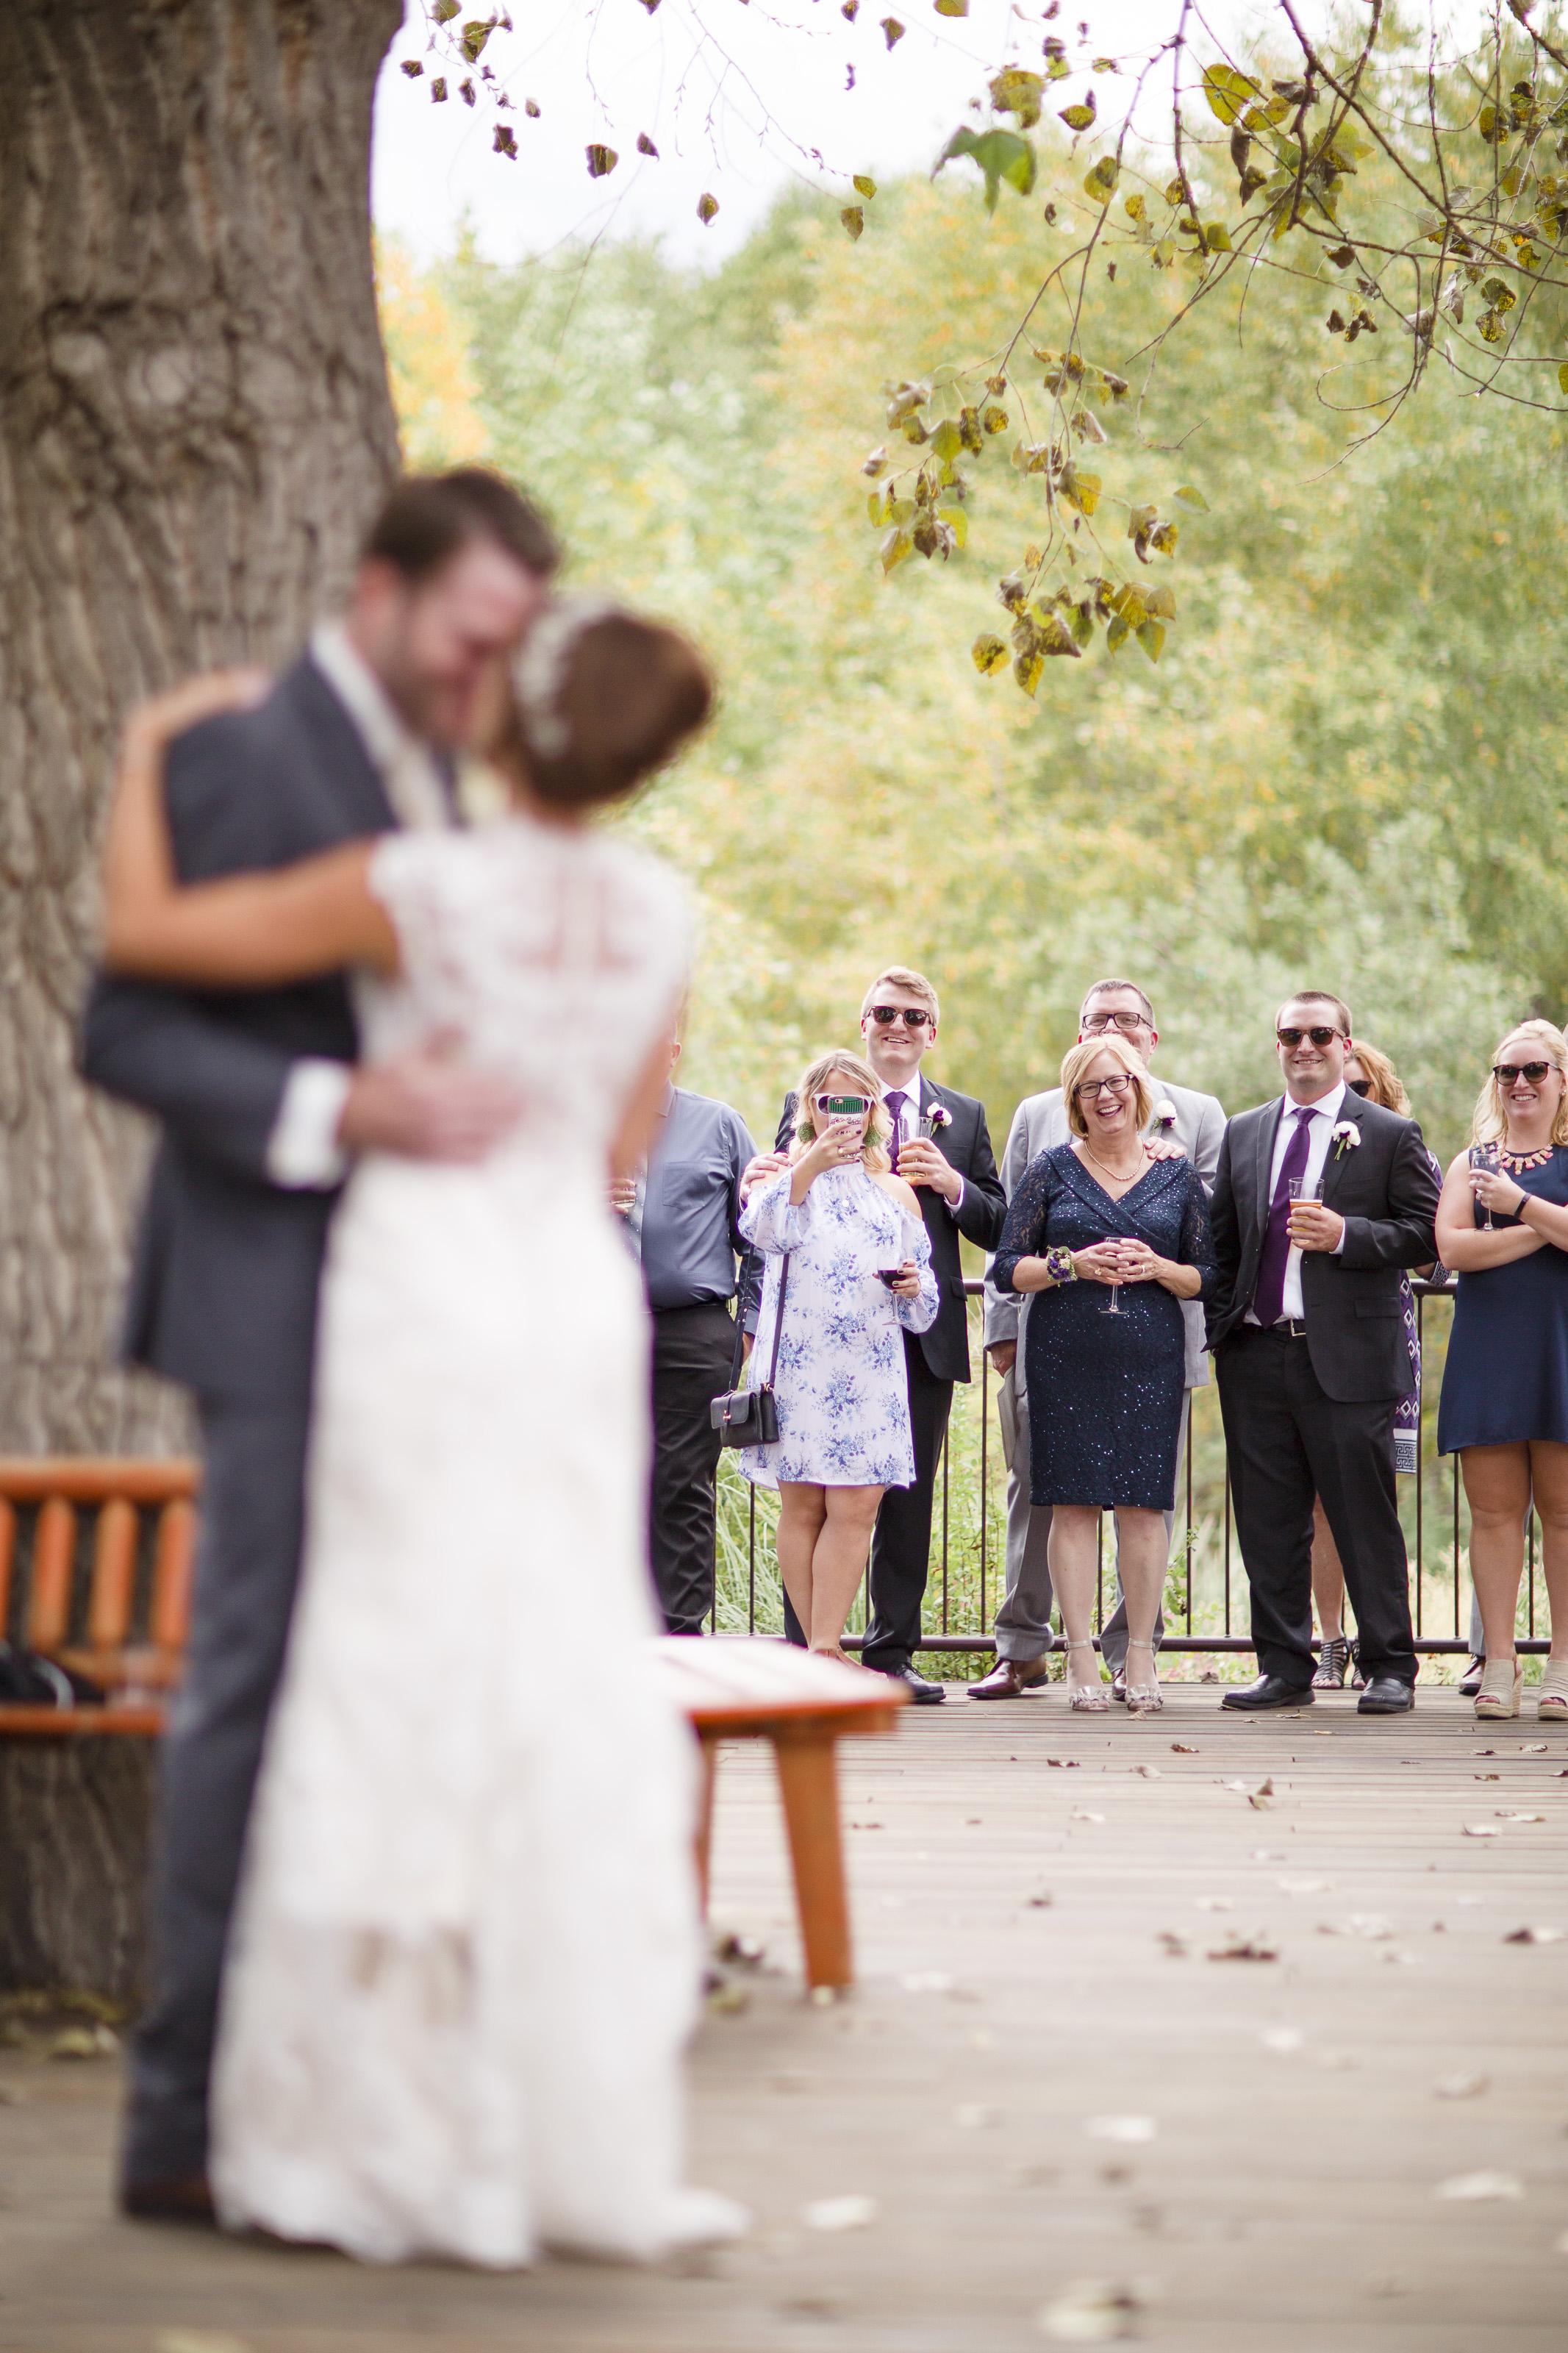 kristen-vance-chatfield-farms-littleton-colorado-fall-wedding-2017-4.jpg